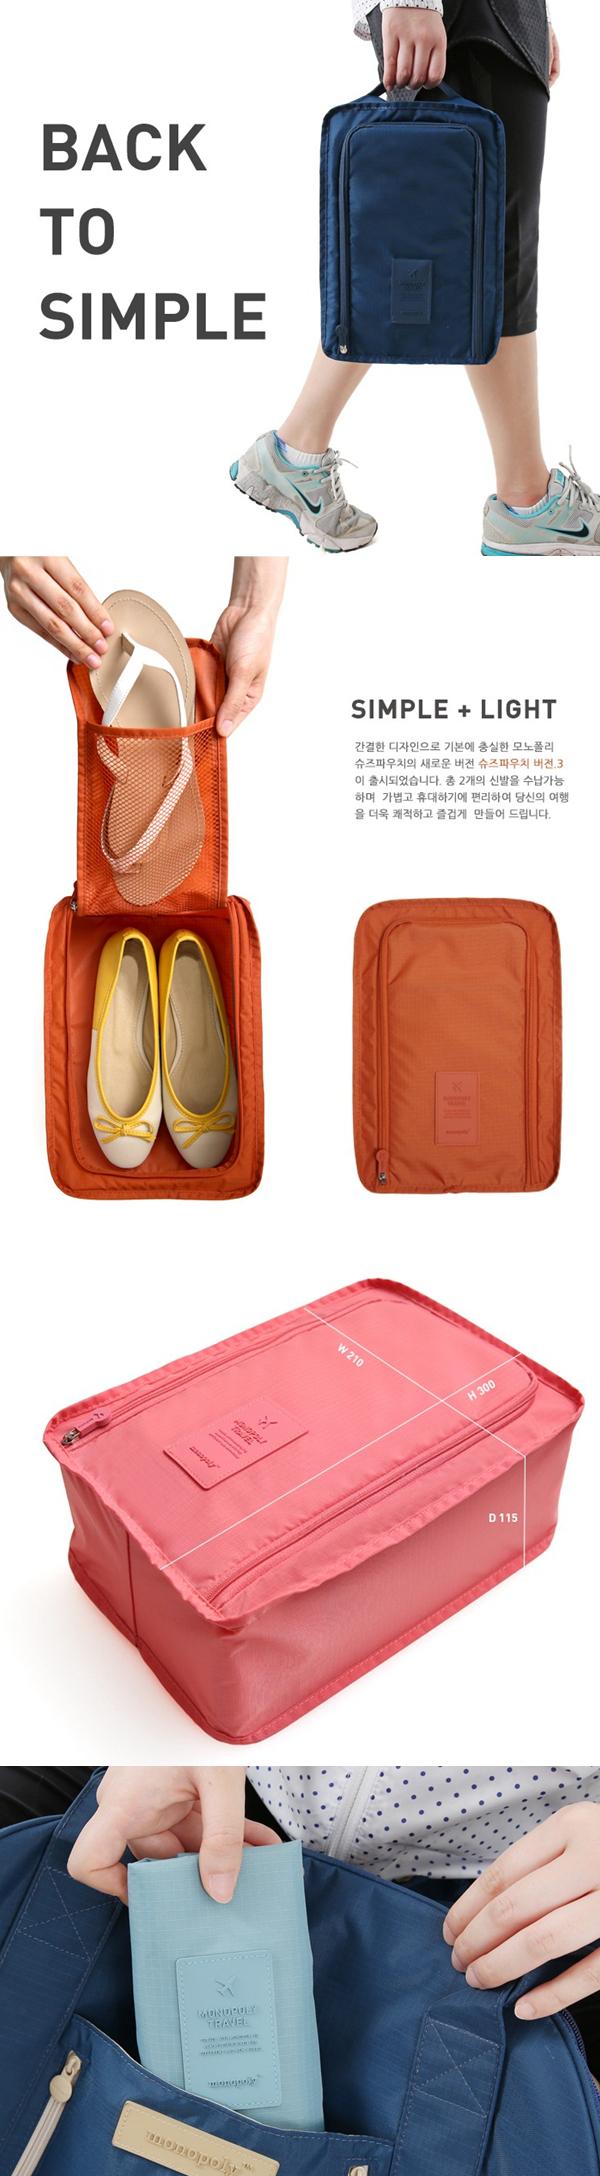 shoe-bag-format-web.jpg